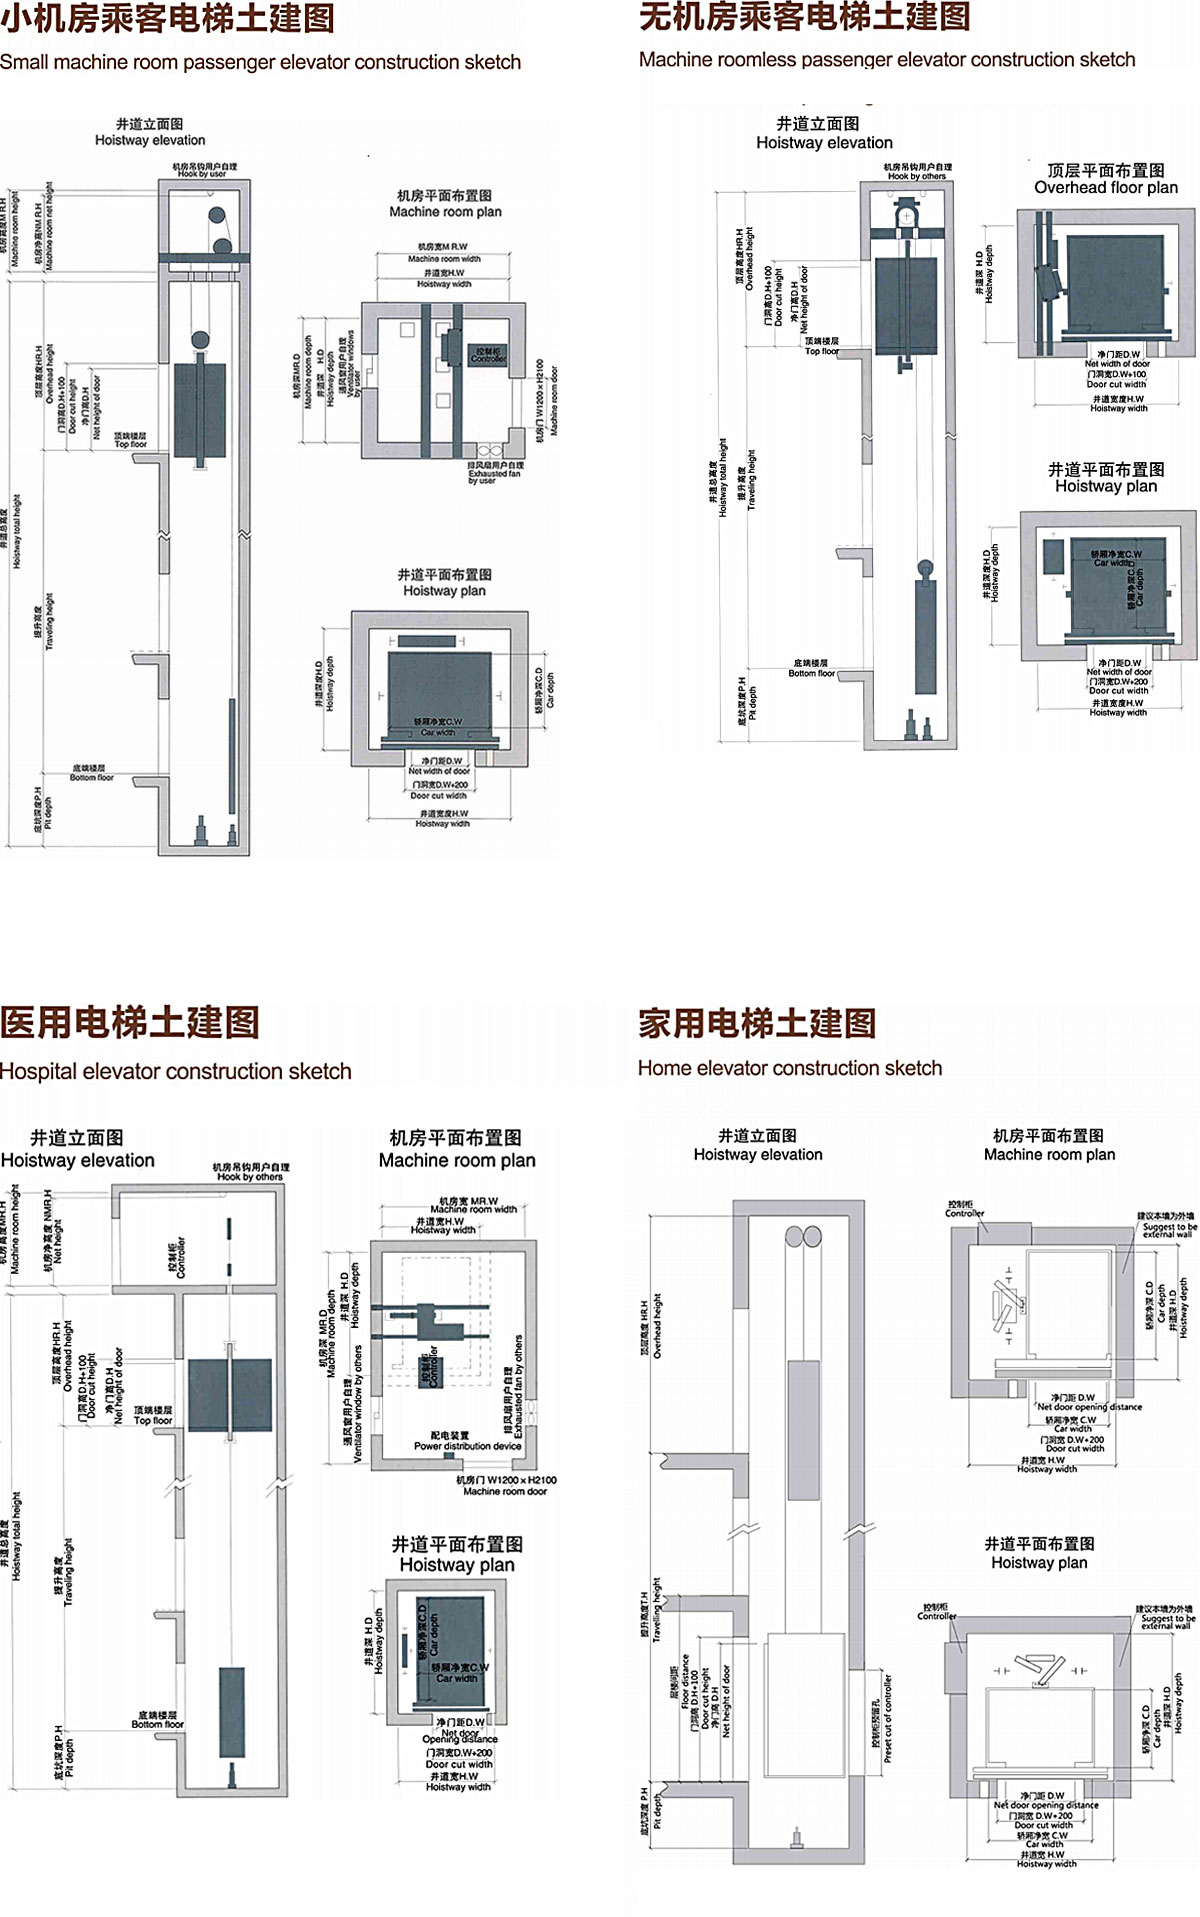 passenger elevator definition